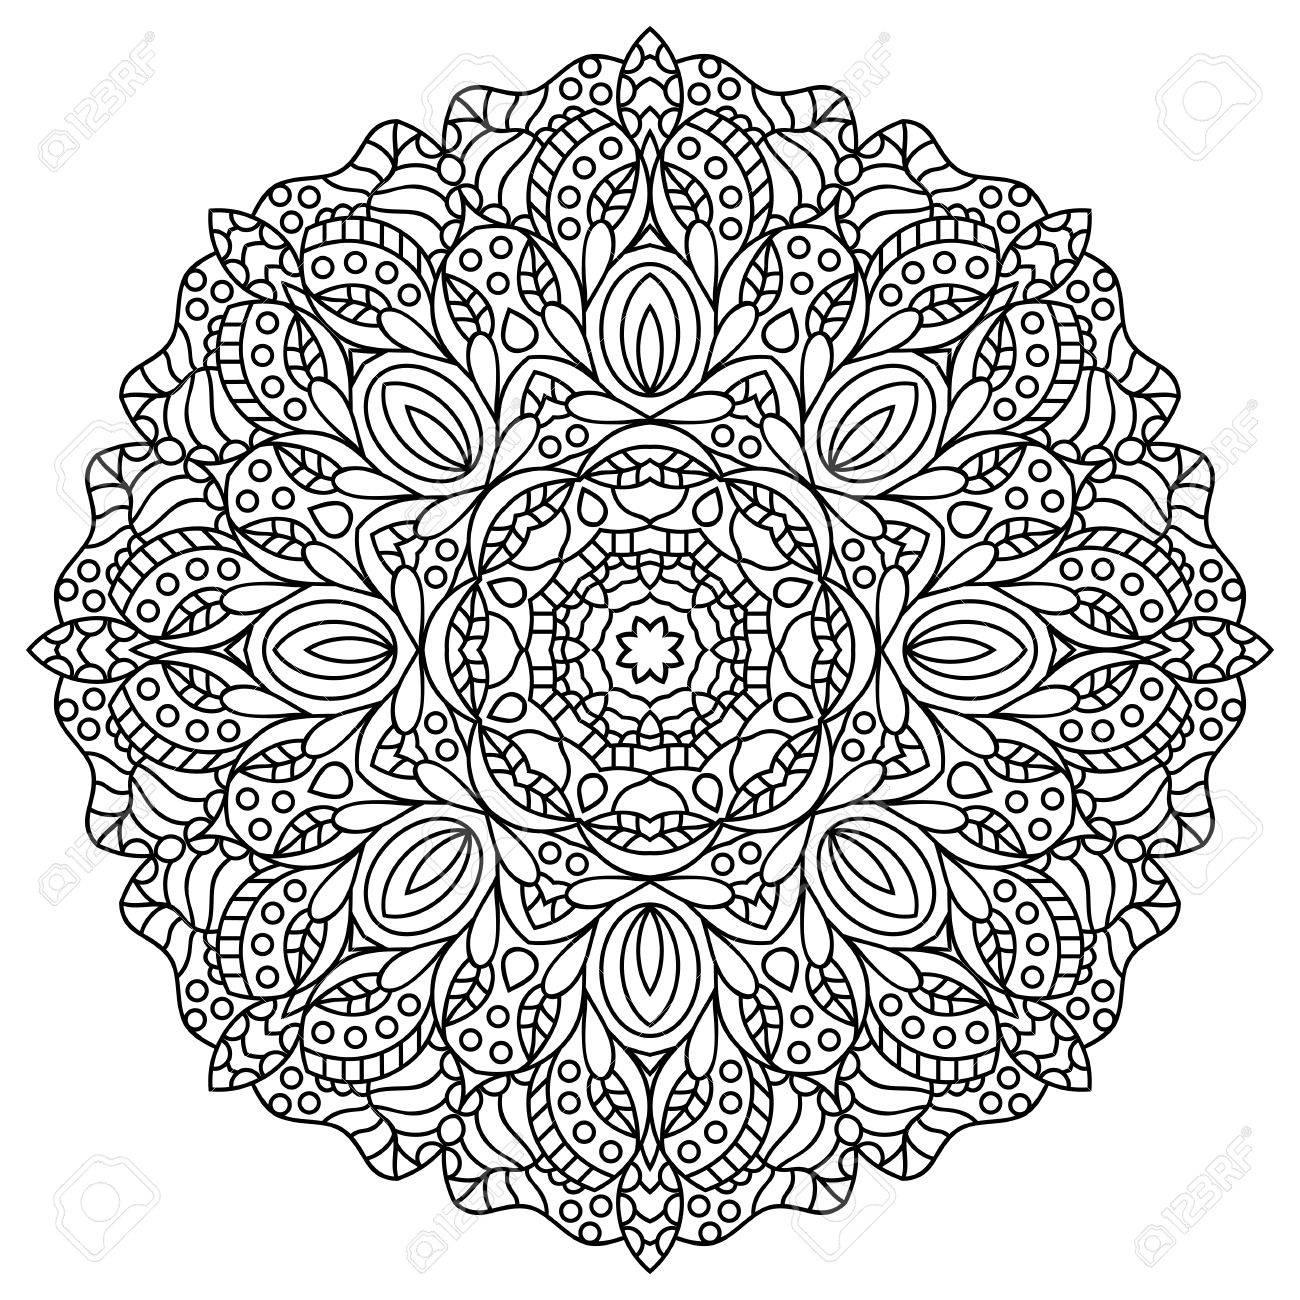 - Mandala. Coloring Book Pages. Indian Antistress Medallion